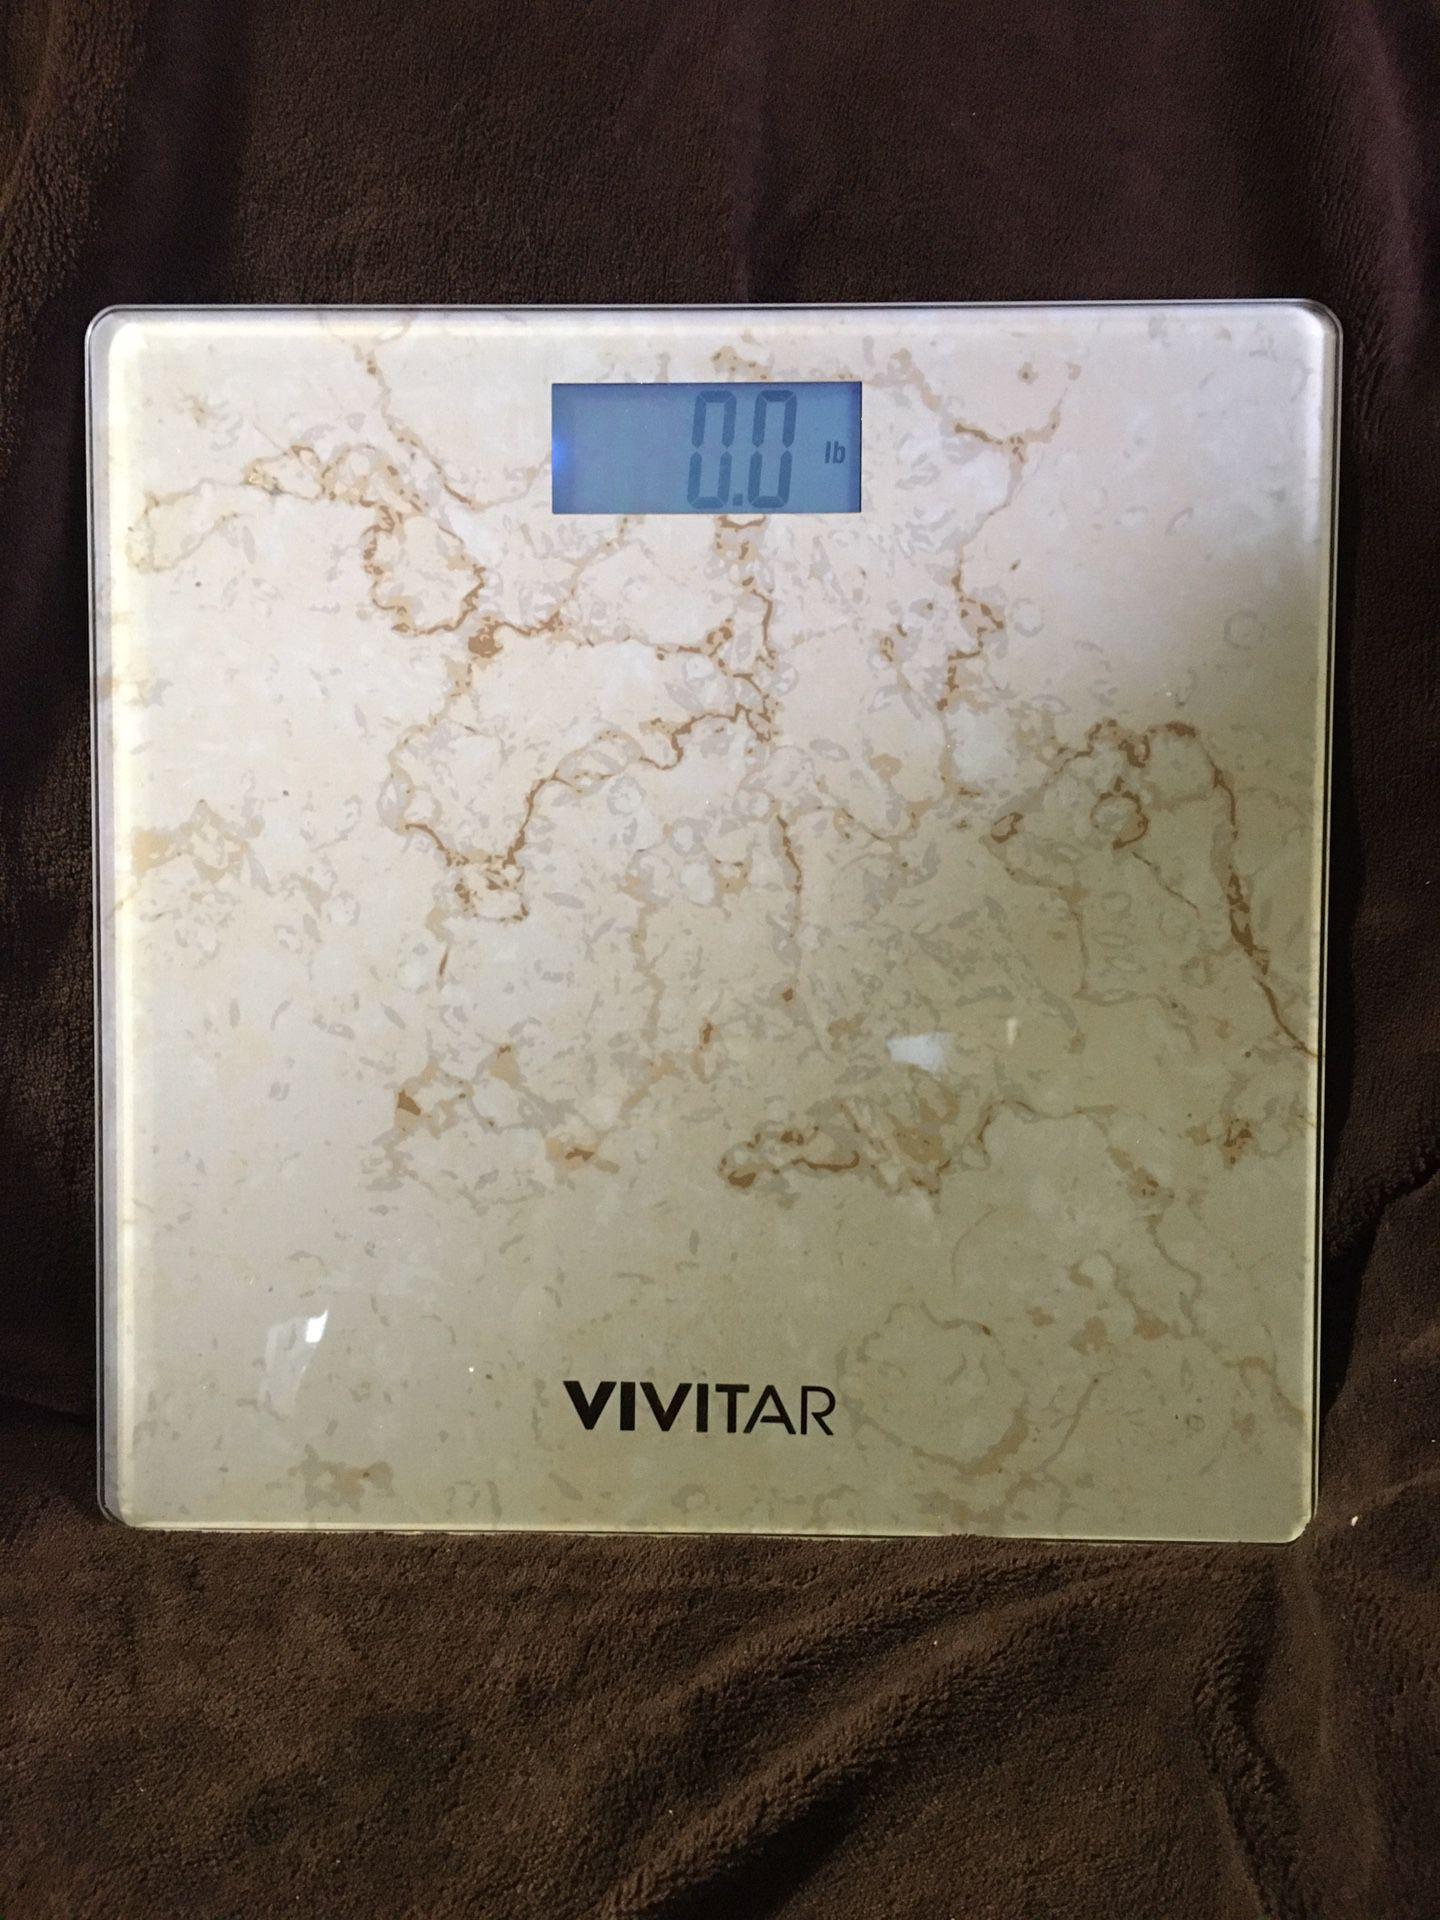 Vivitar bathroom scale for sale